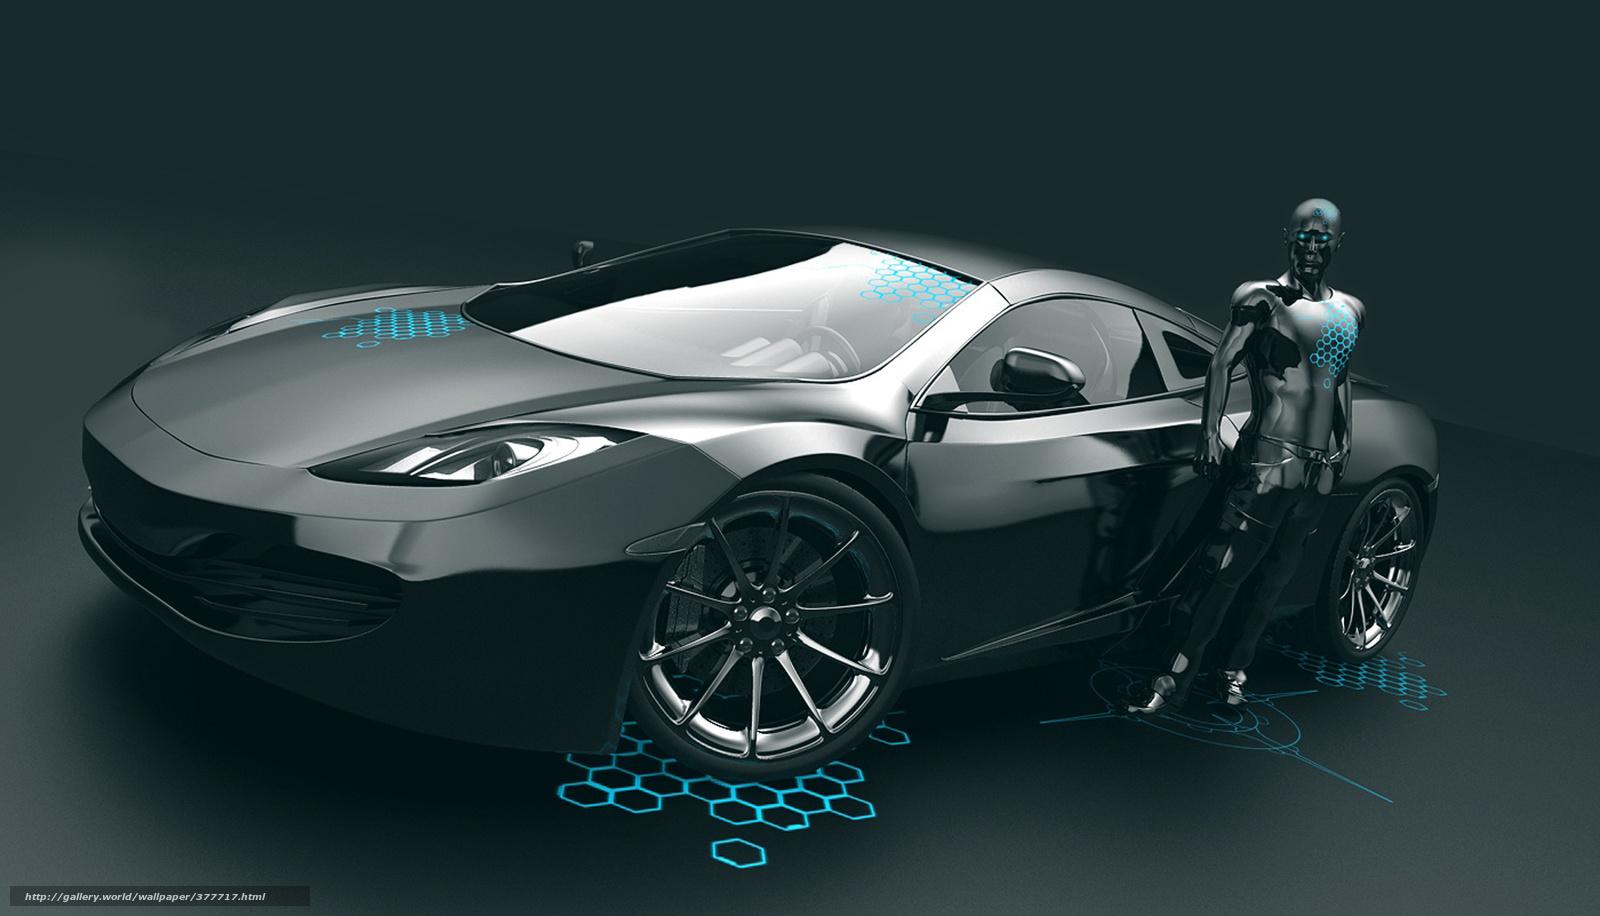 Download wallpaper robot Car android desktop wallpaper in the 1600x916